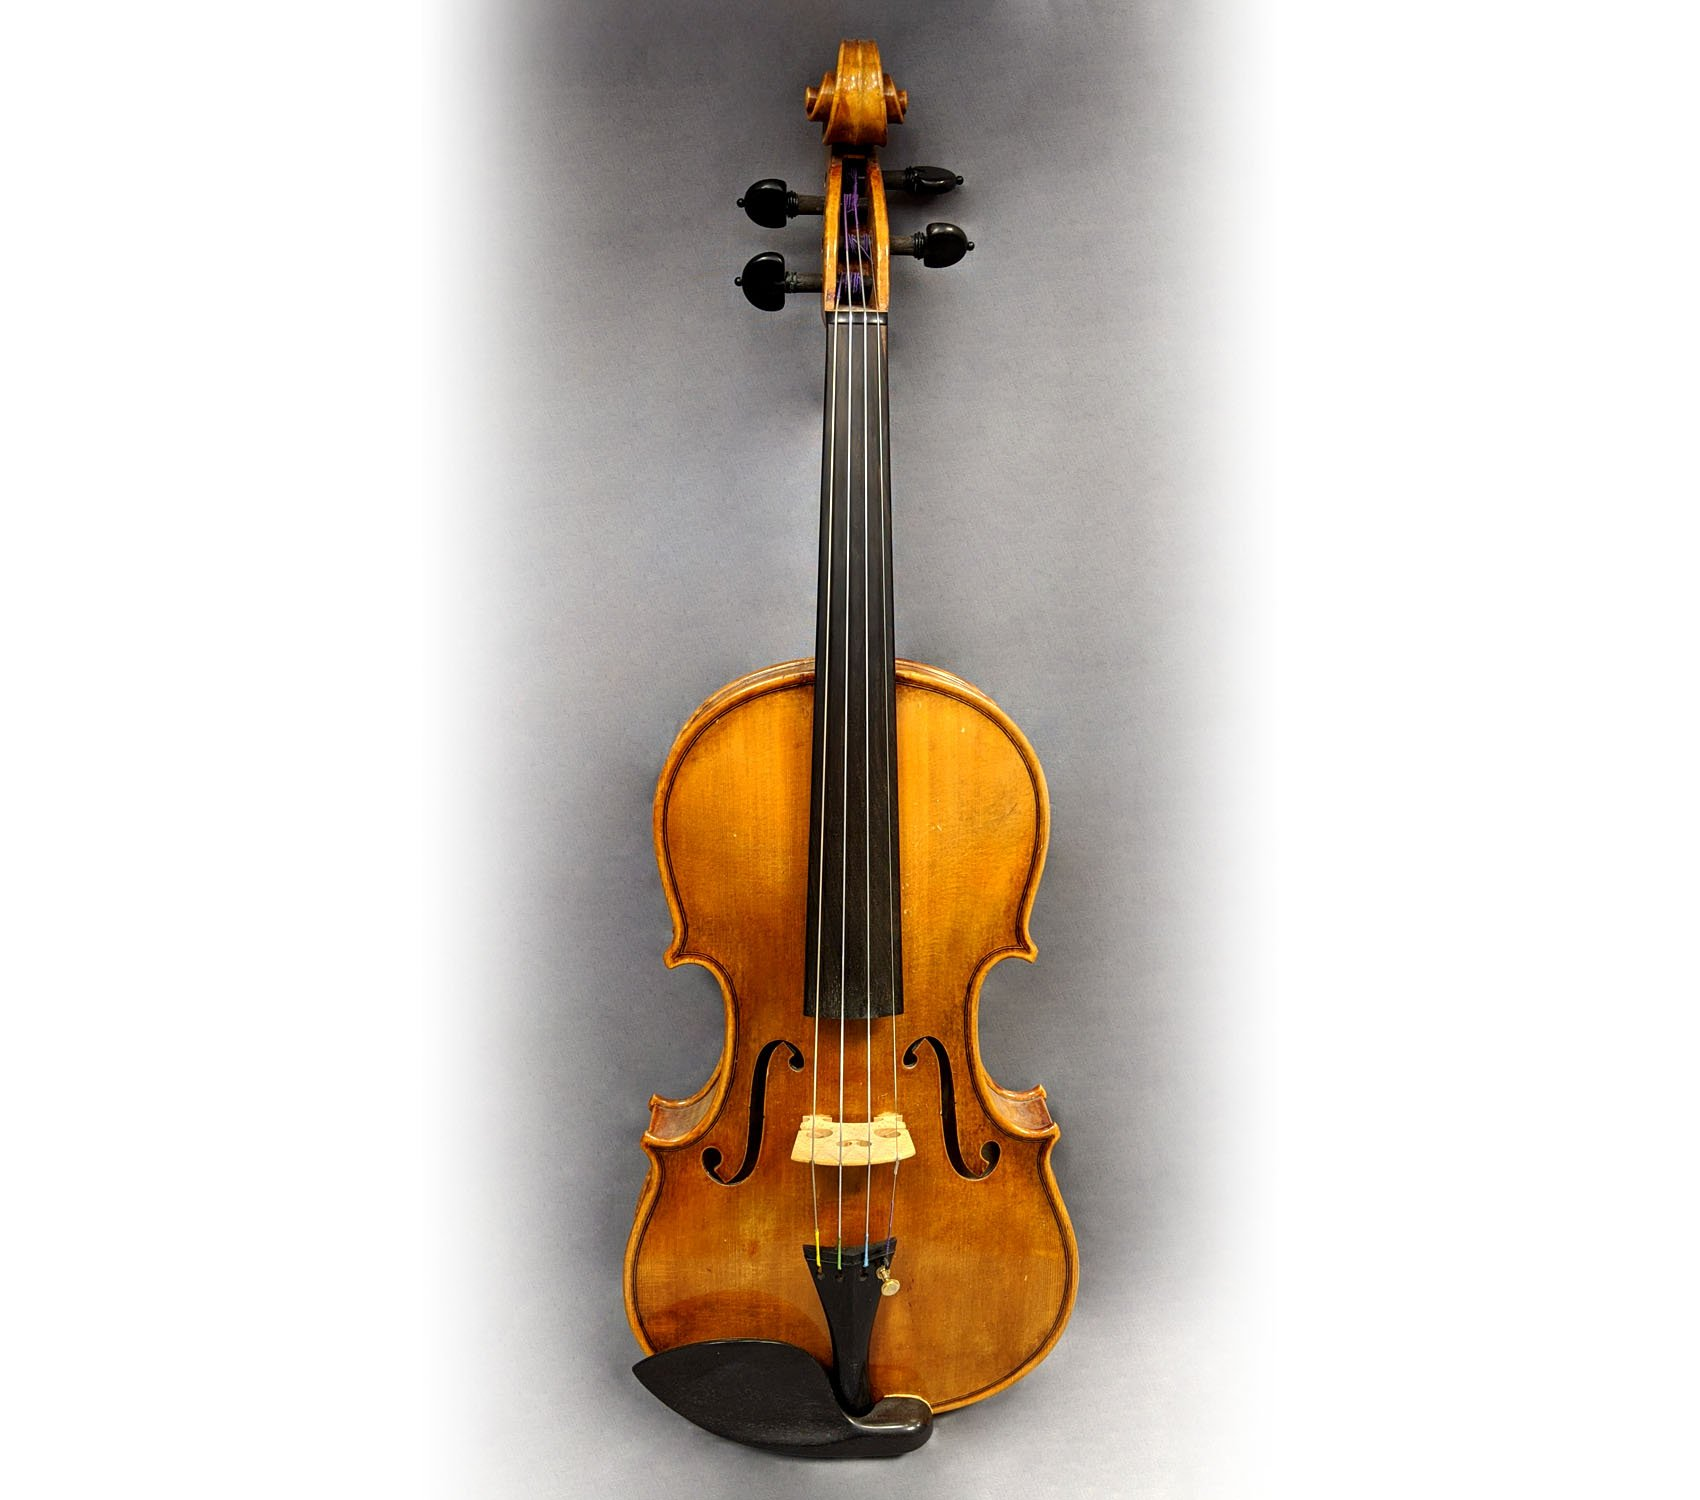 Georgi Markov fecit Plovdiv Bulgarian Violin